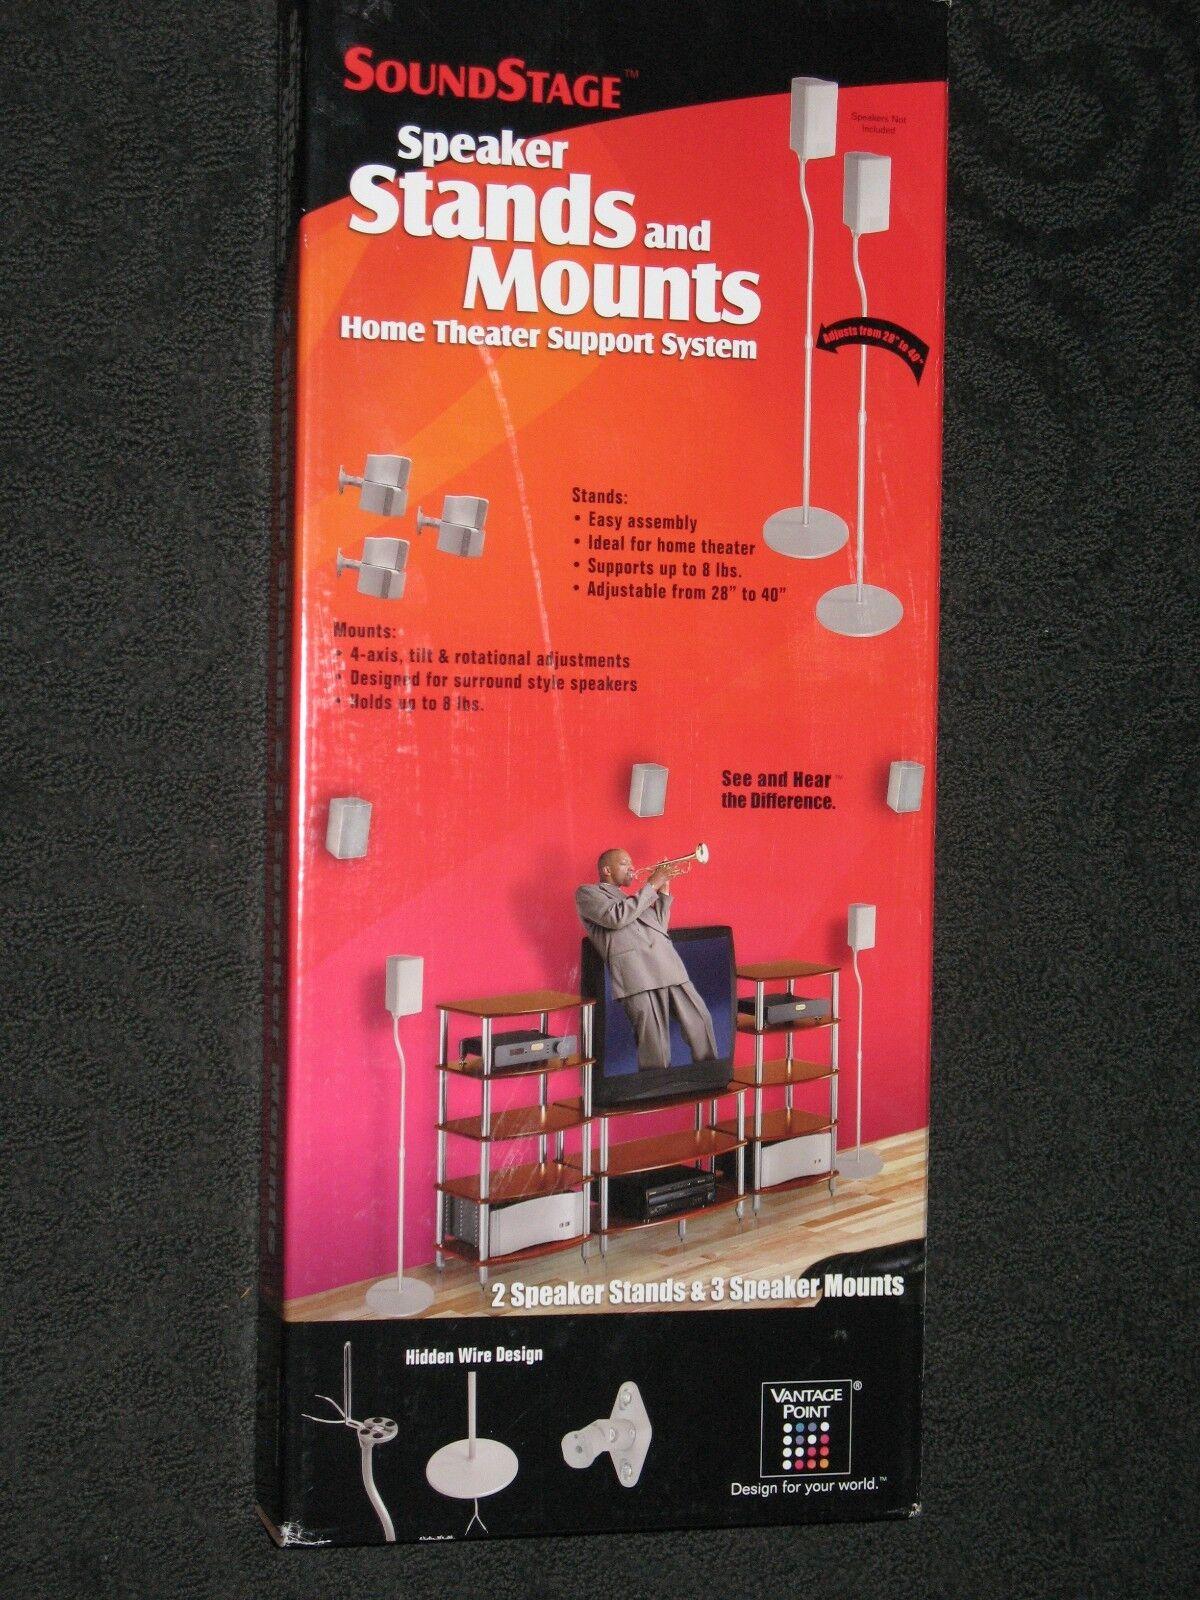 Vantage Point 3-SAT BookShelf Wall Mounts 2 Satellite Stand